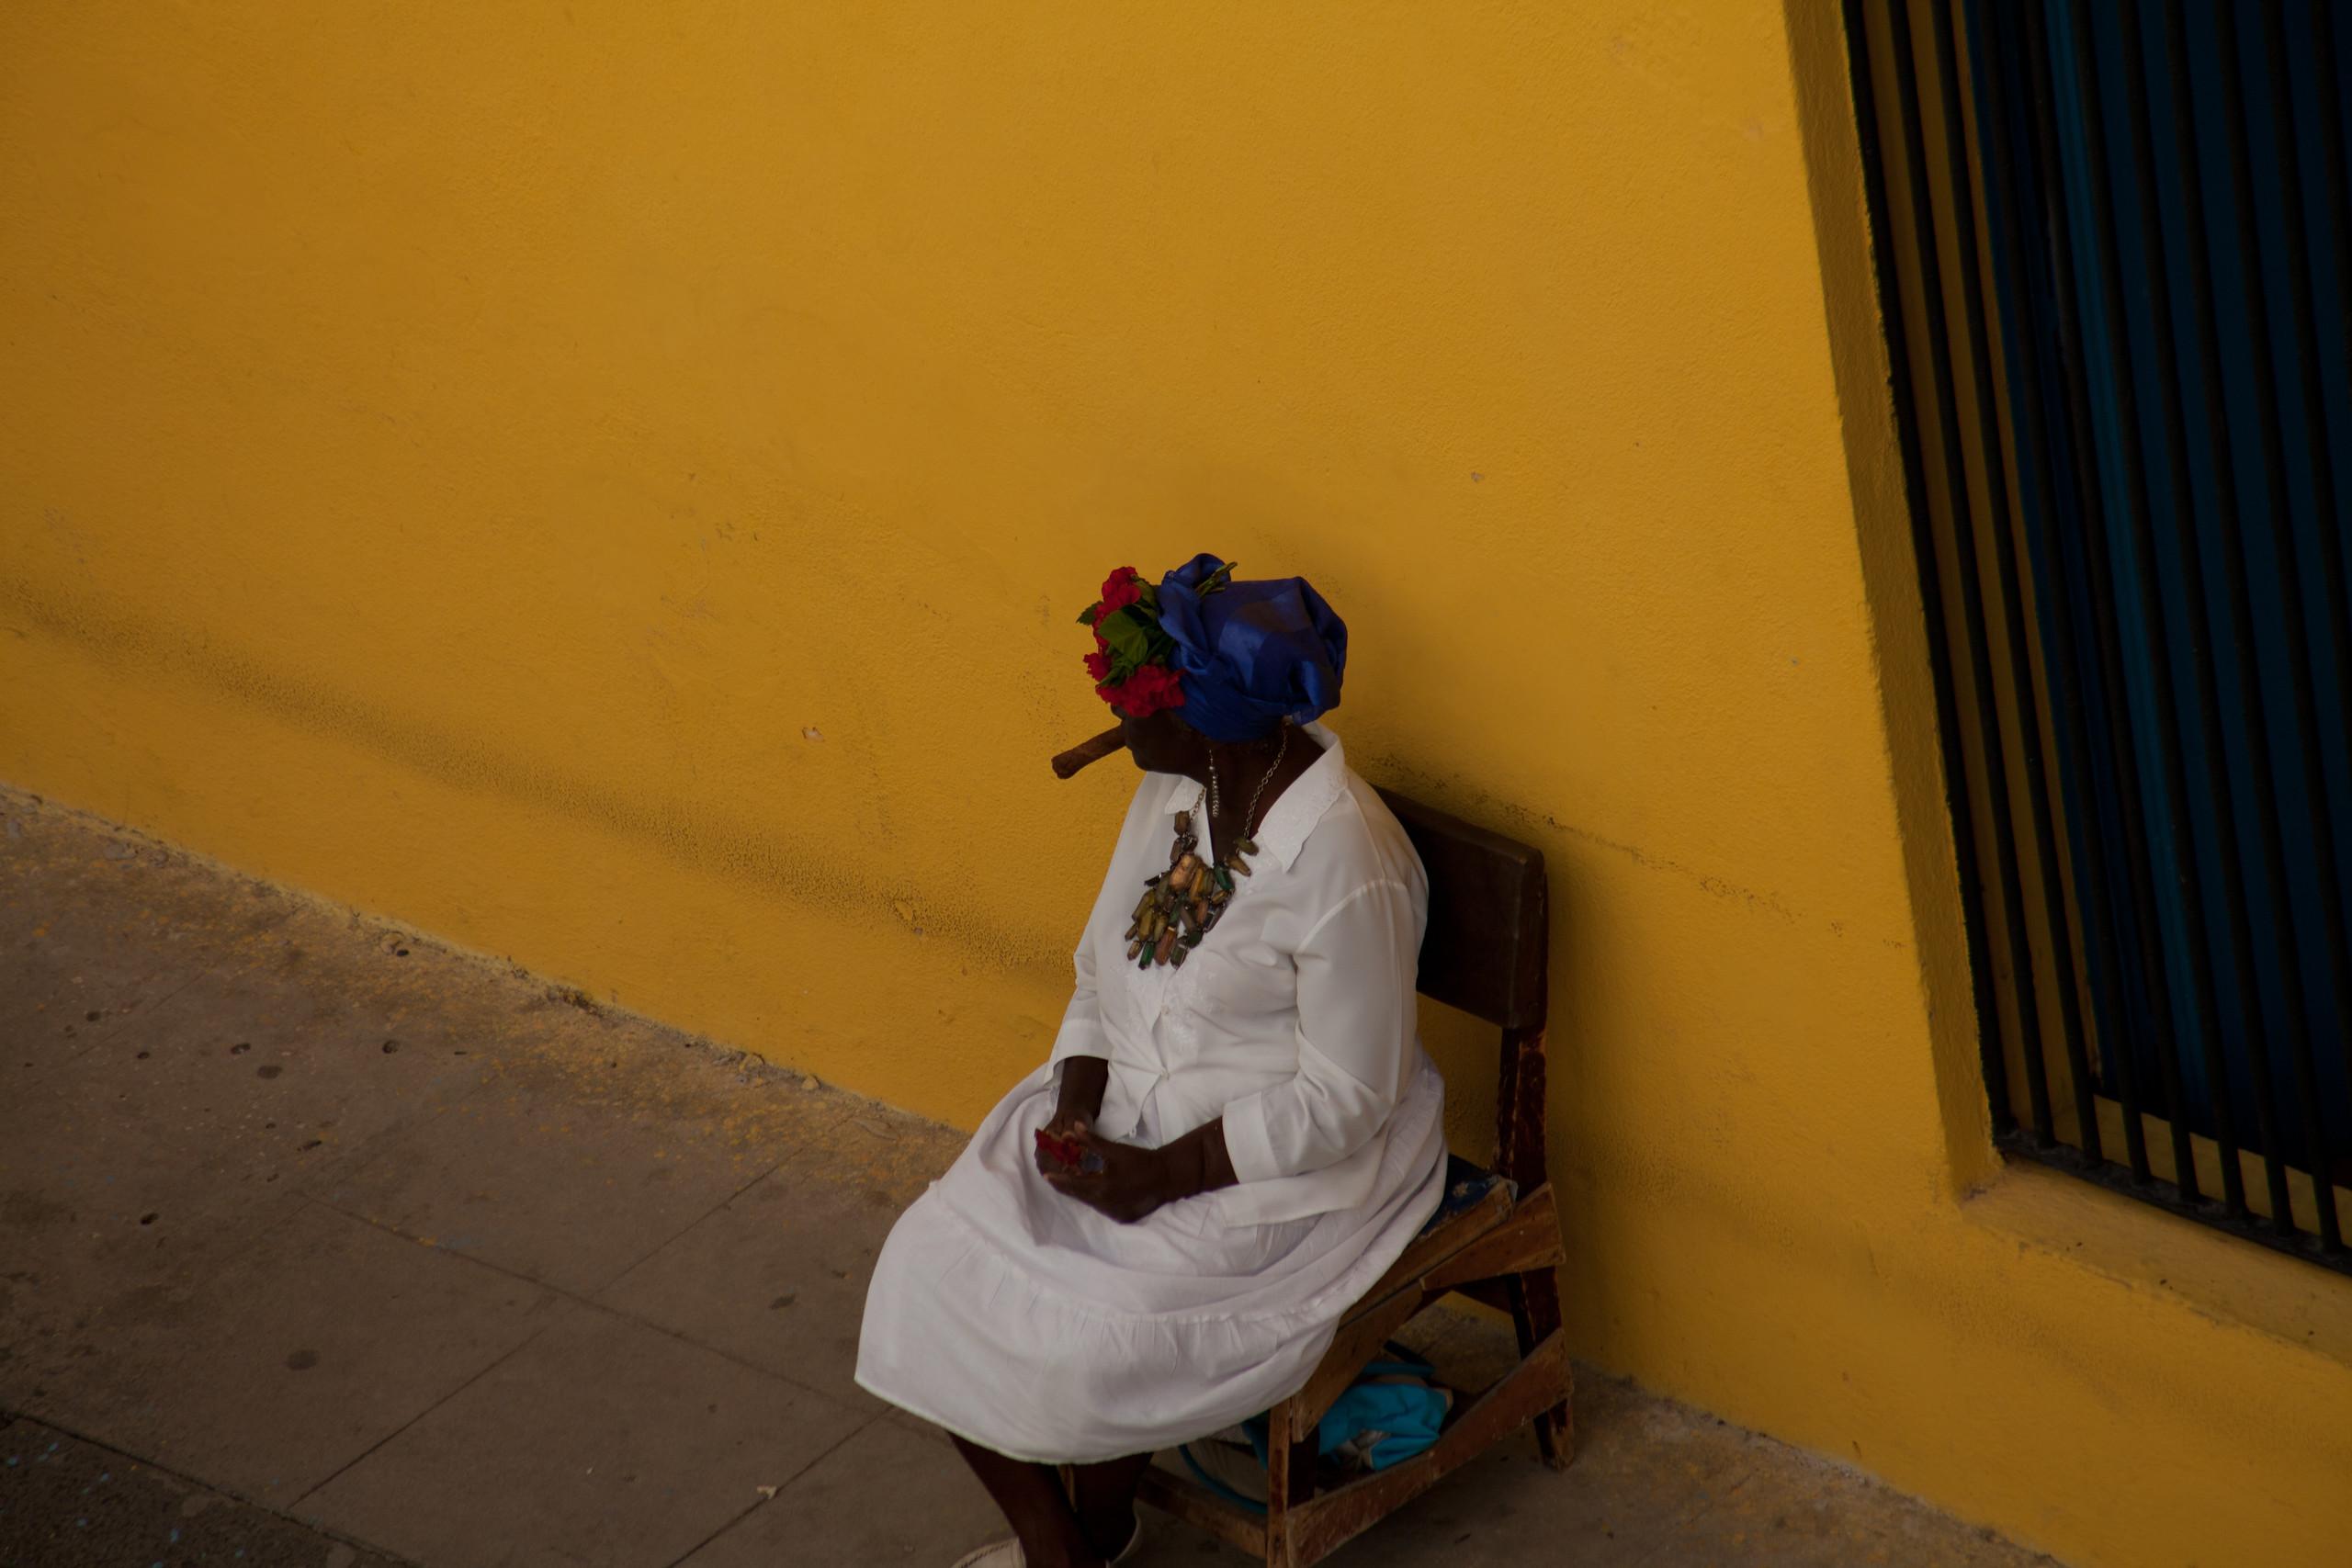 Cigar smoking fortune teller near Catedral Plaza, Havana